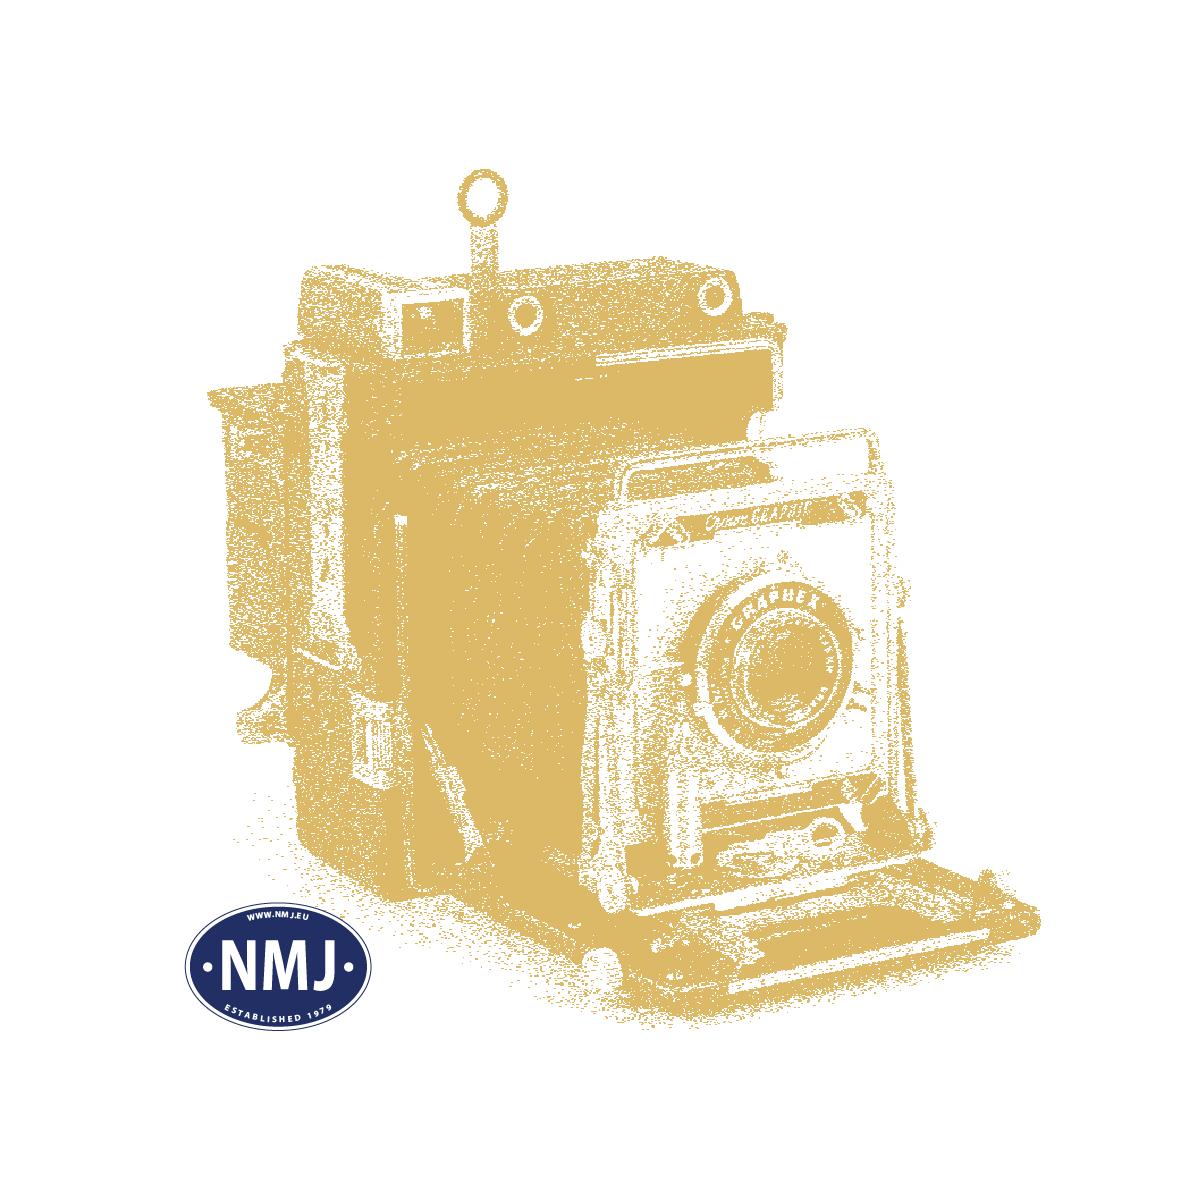 WODFS619 - Lysegrønt Statisk Gress, 4mm, 42g